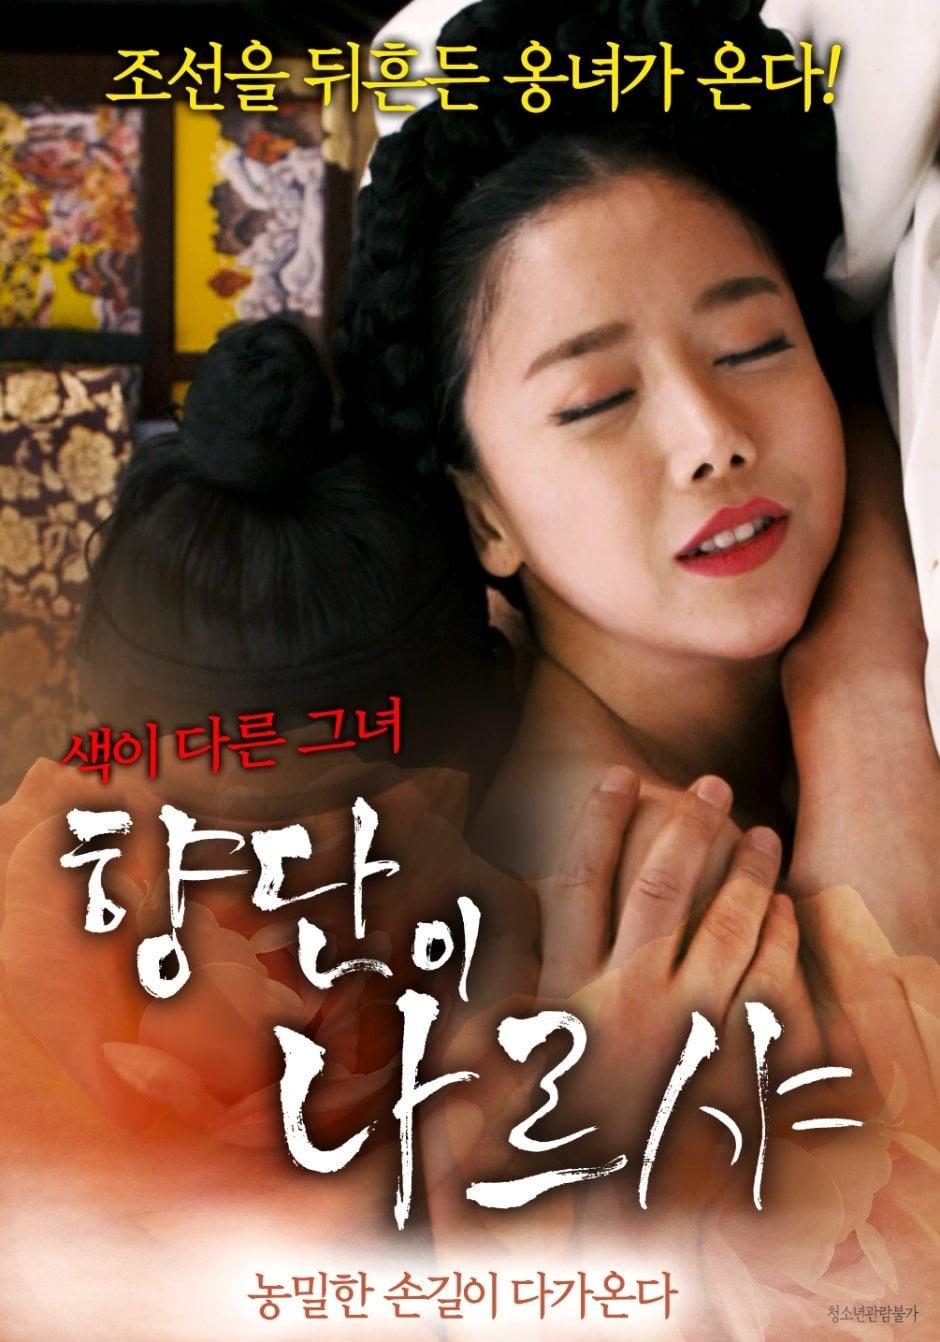 Hyangdan - Director's Cut